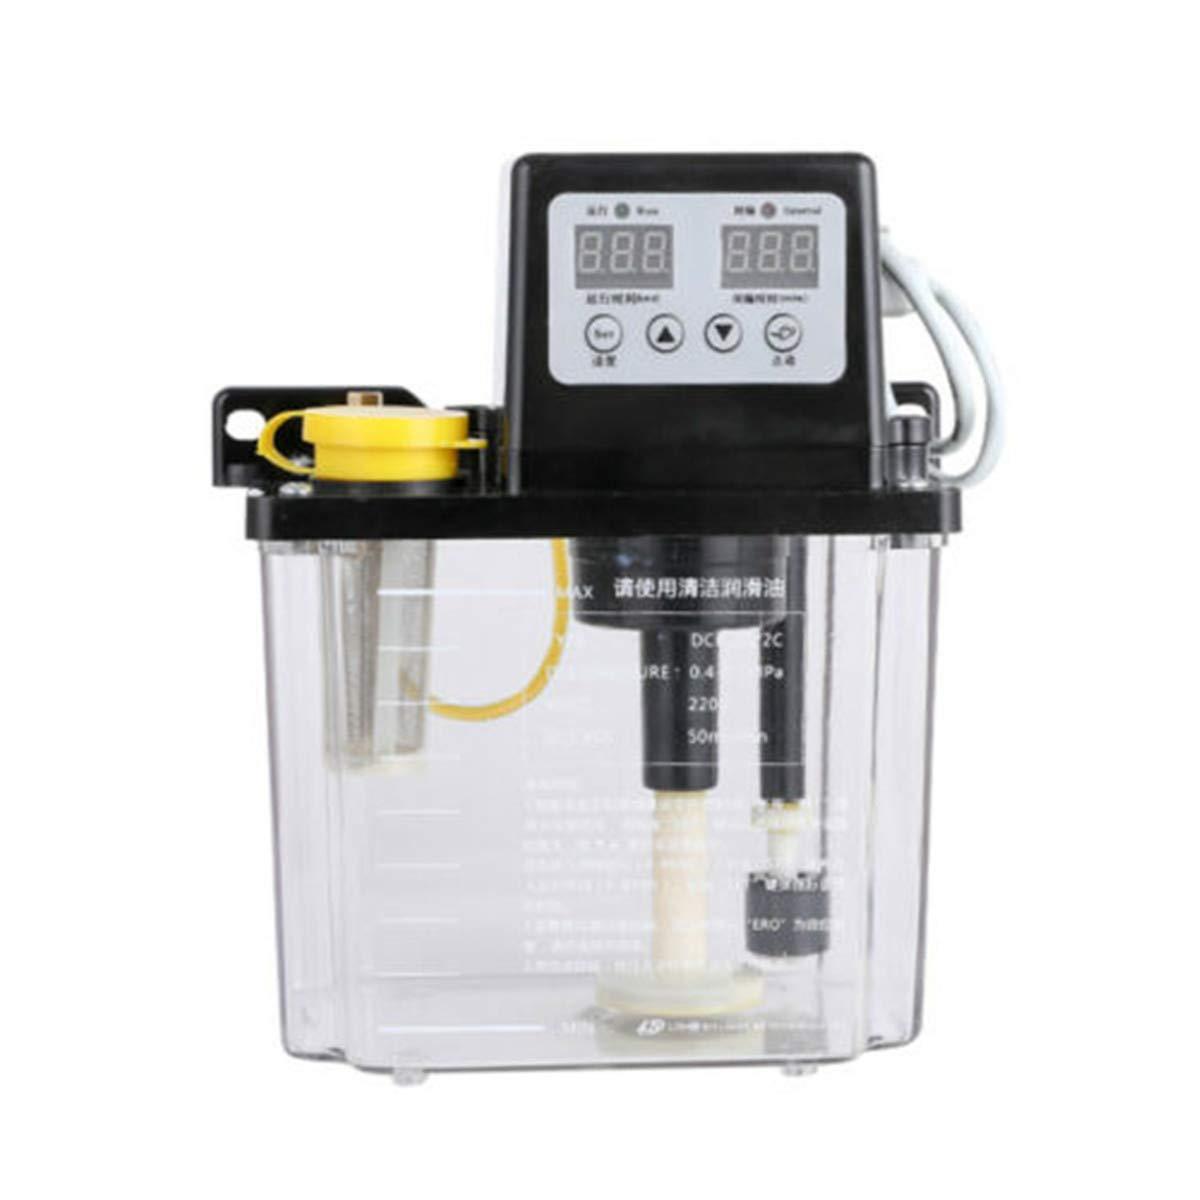 110V 2L Dual Digital Display Automatic Electric Lubrication Pump Oiler NC Pump CNC Engraving Router Machine Oil Pump